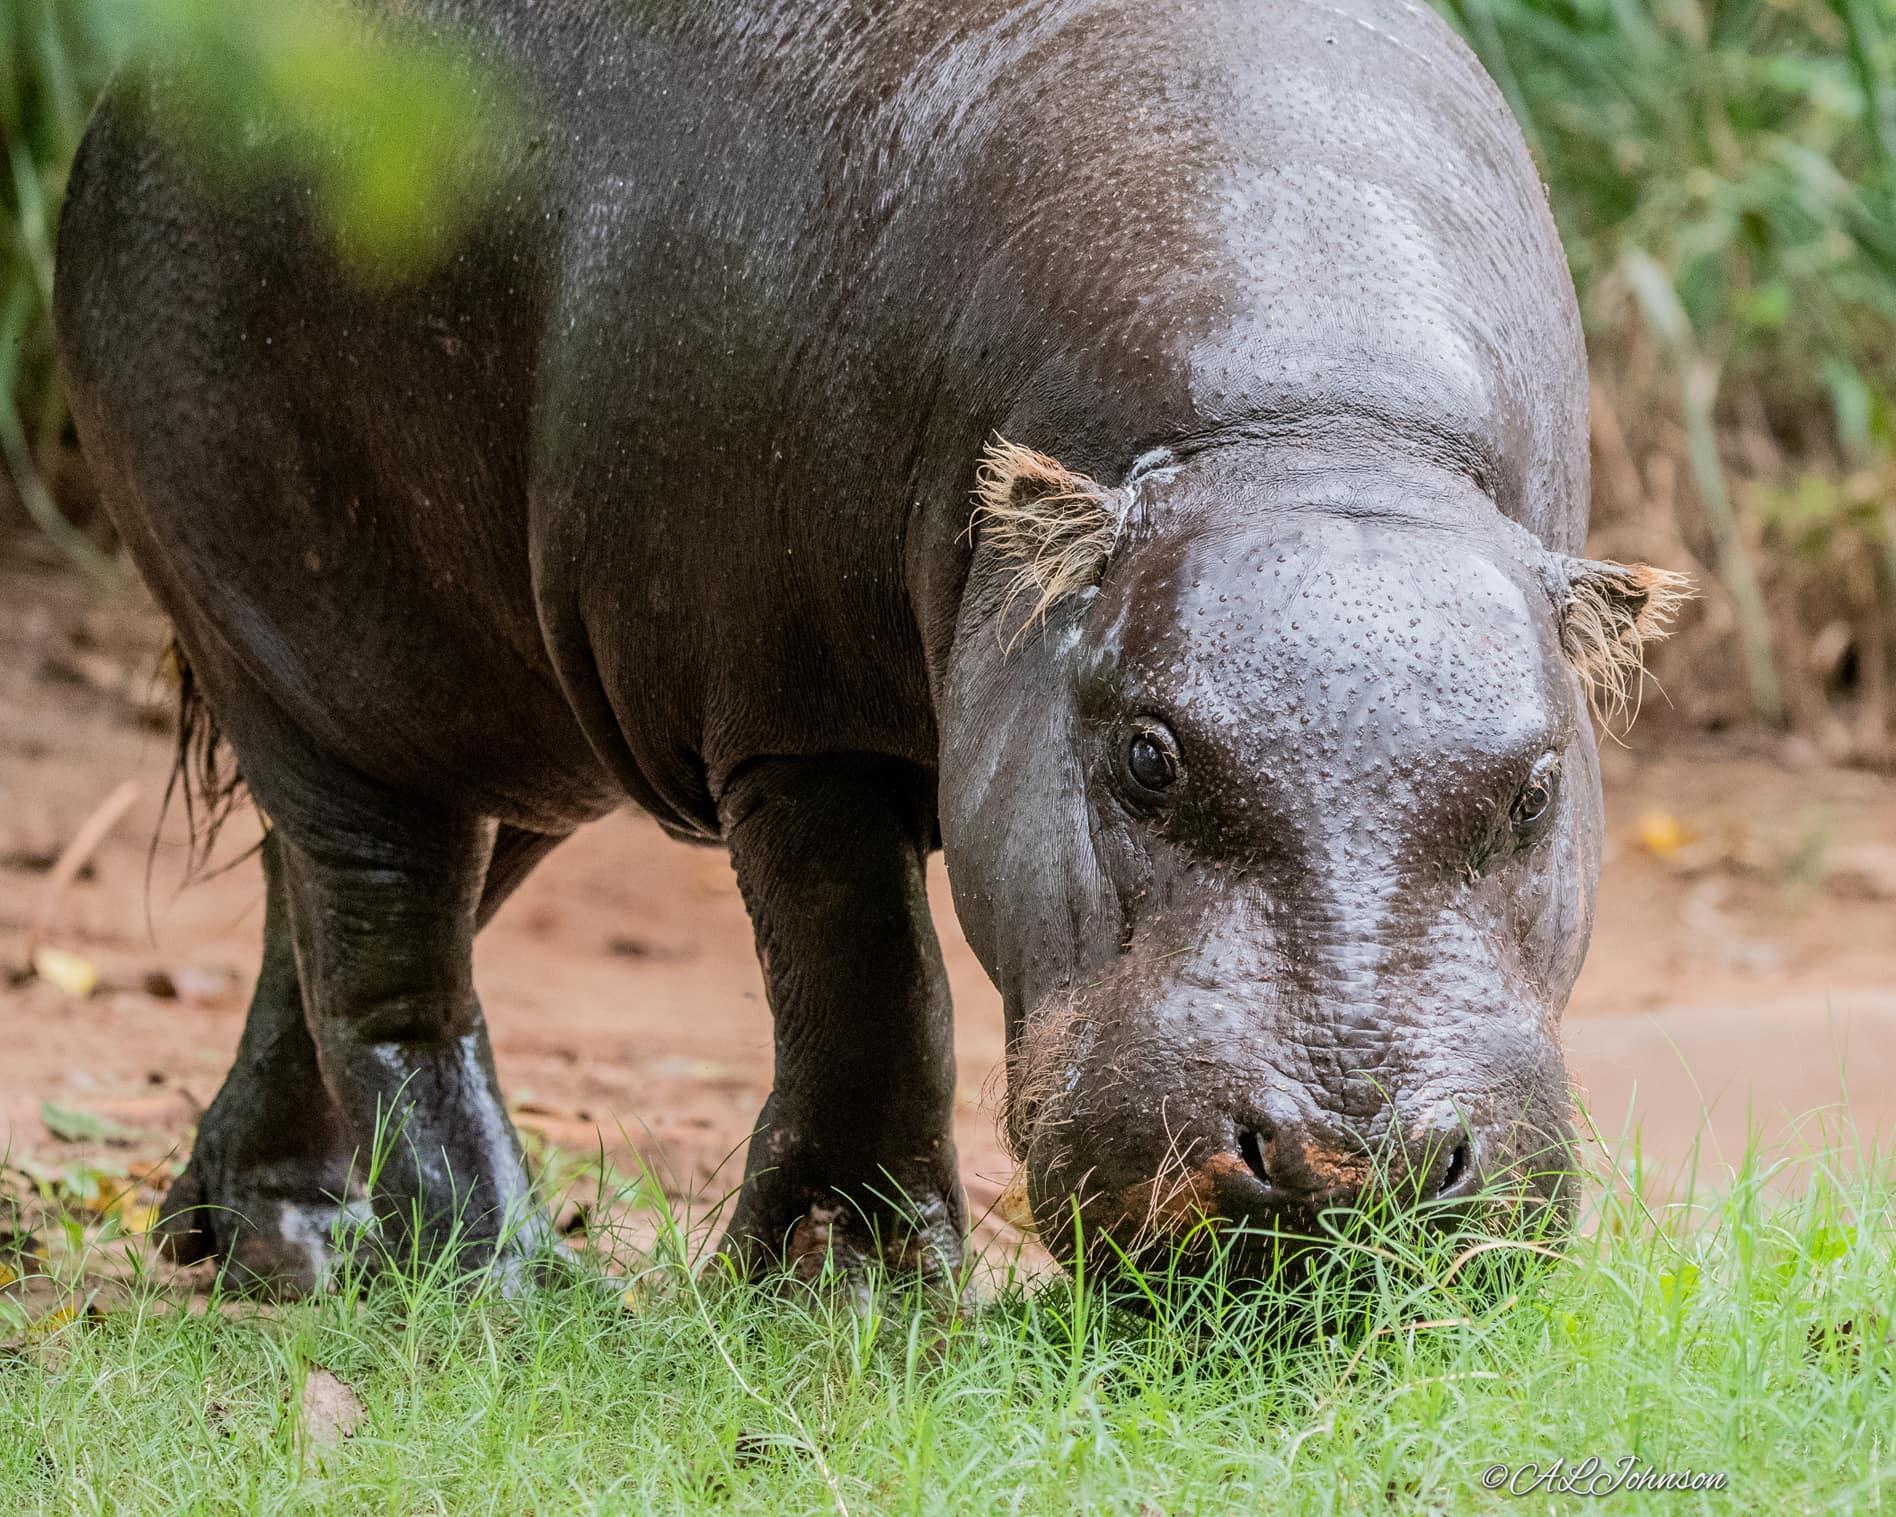 Pygmy Hippo Wolee credit Andrea Johnson